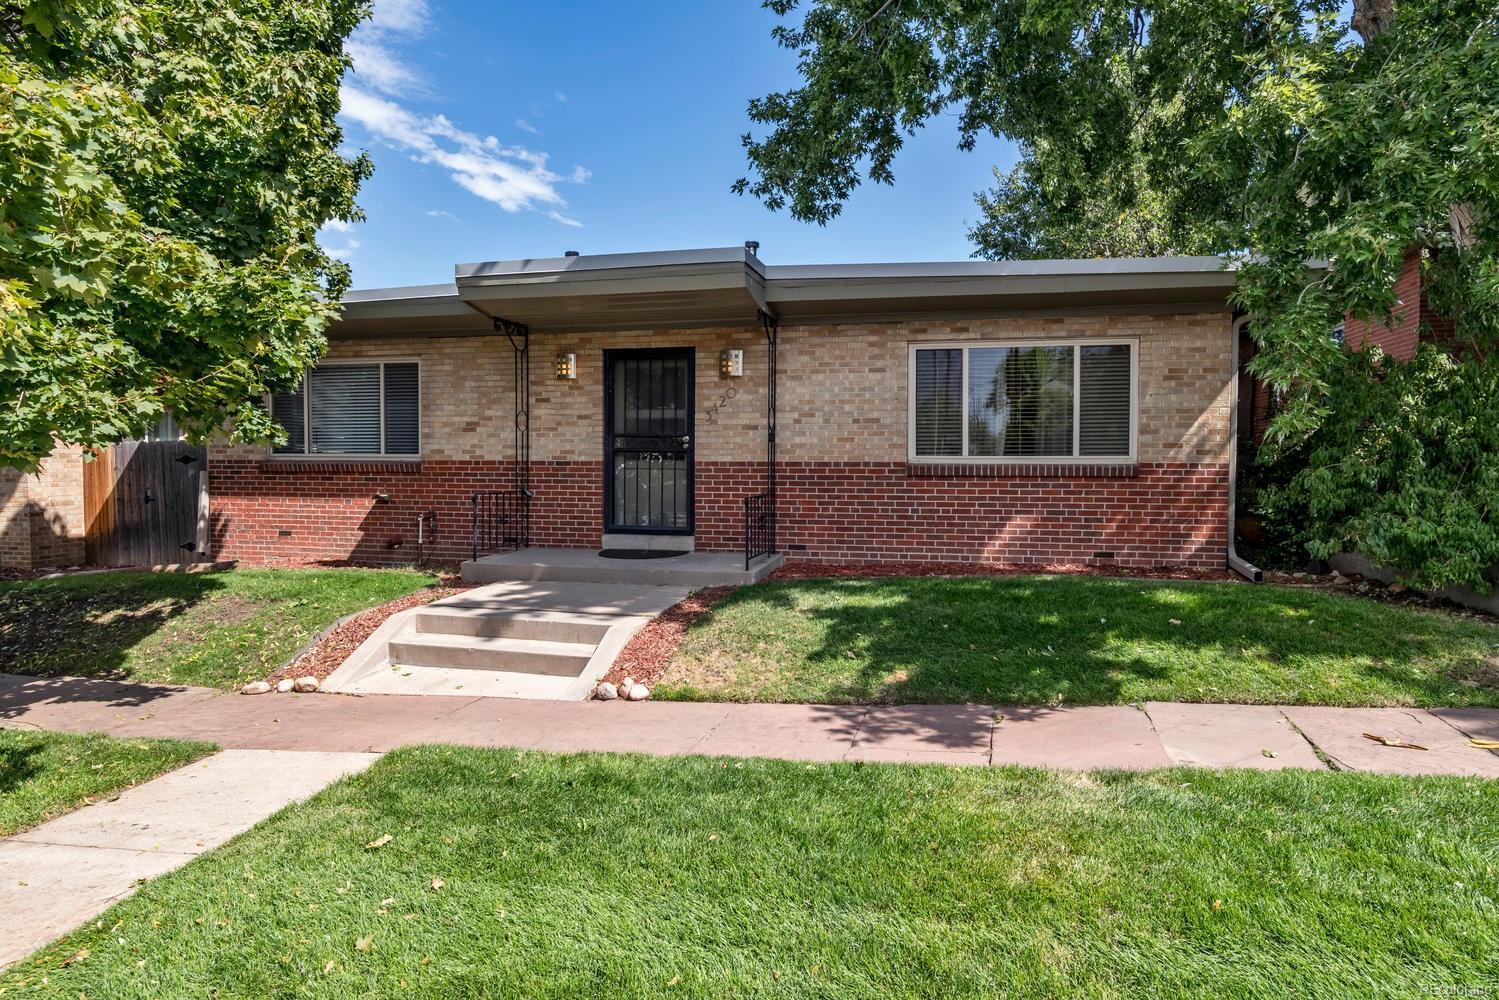 3420 Tennyson Street #103, Denver, CO 80212 - Denver, CO real estate listing